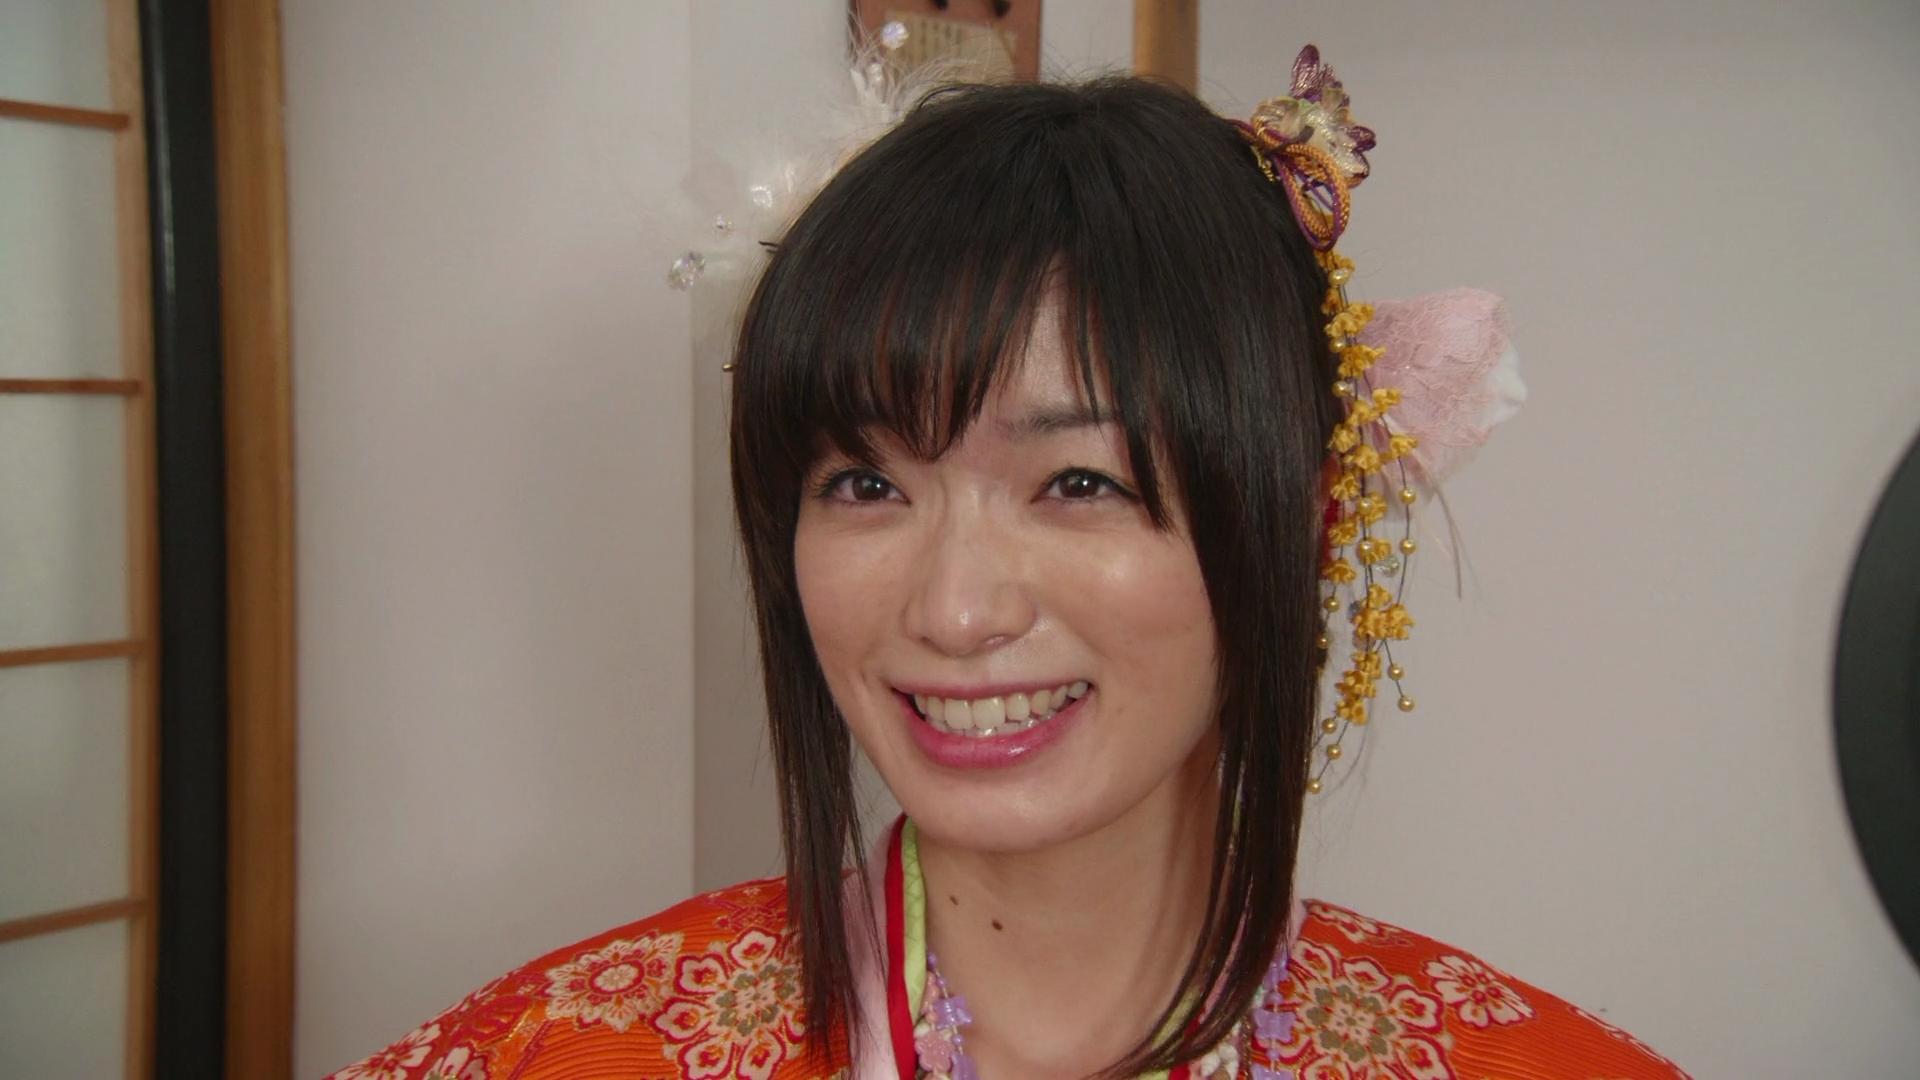 Miwako Hino